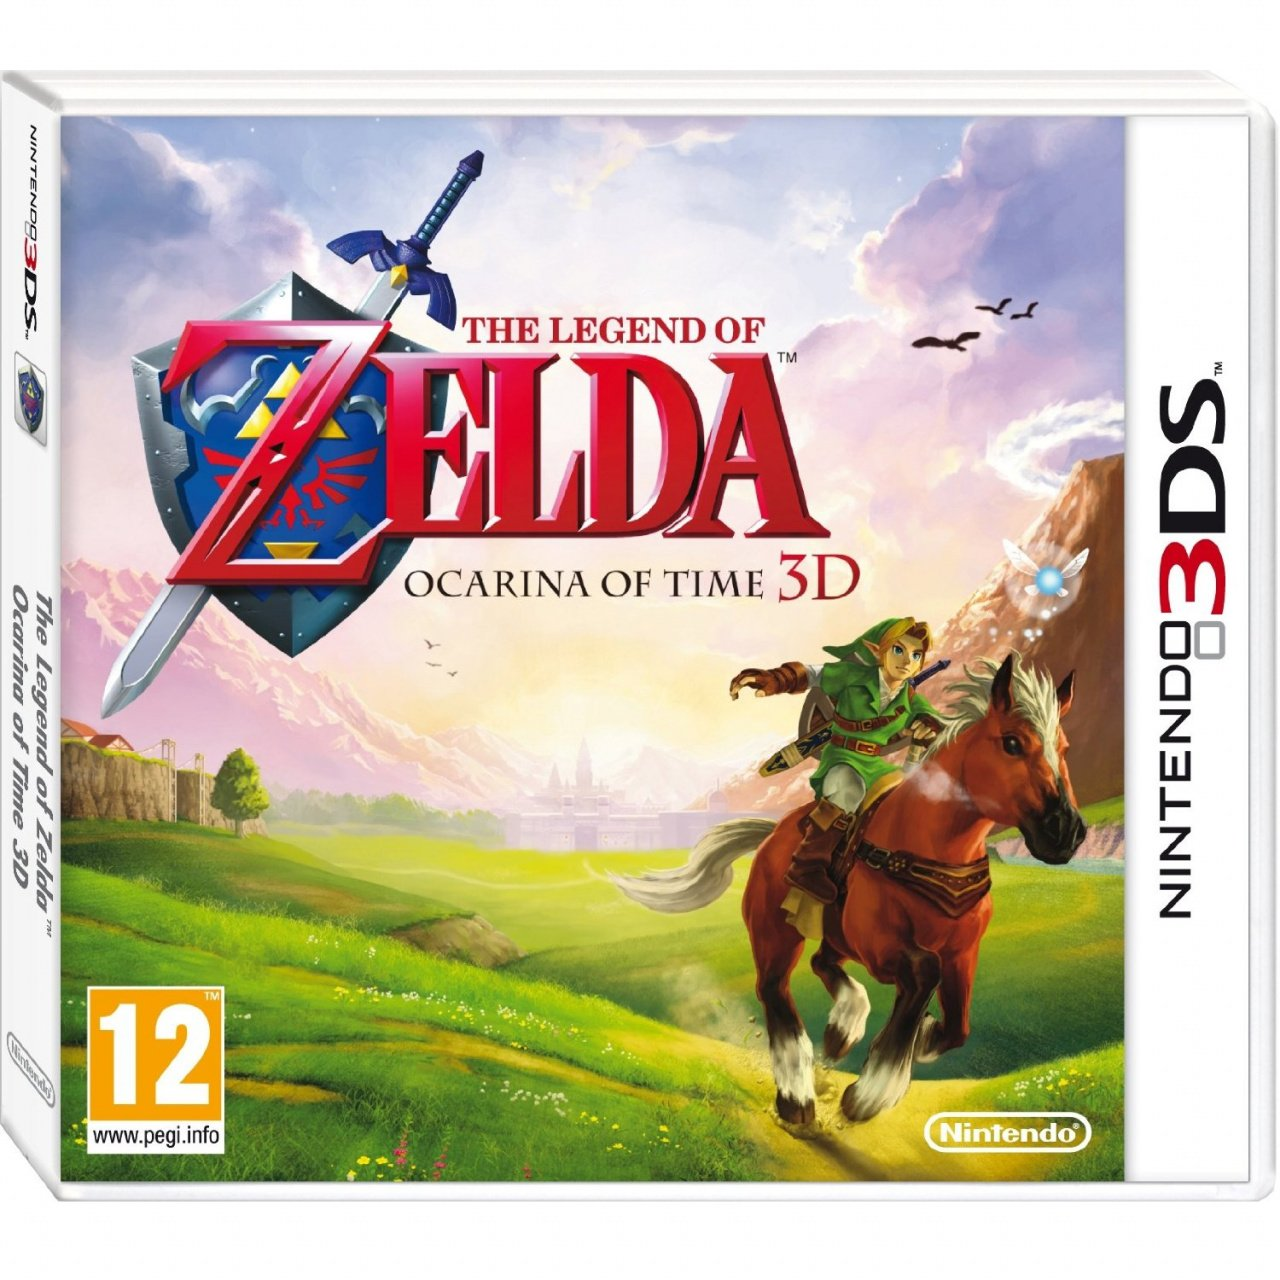 Zelda: Ocarina of Time 3D's European Box Art is Simply